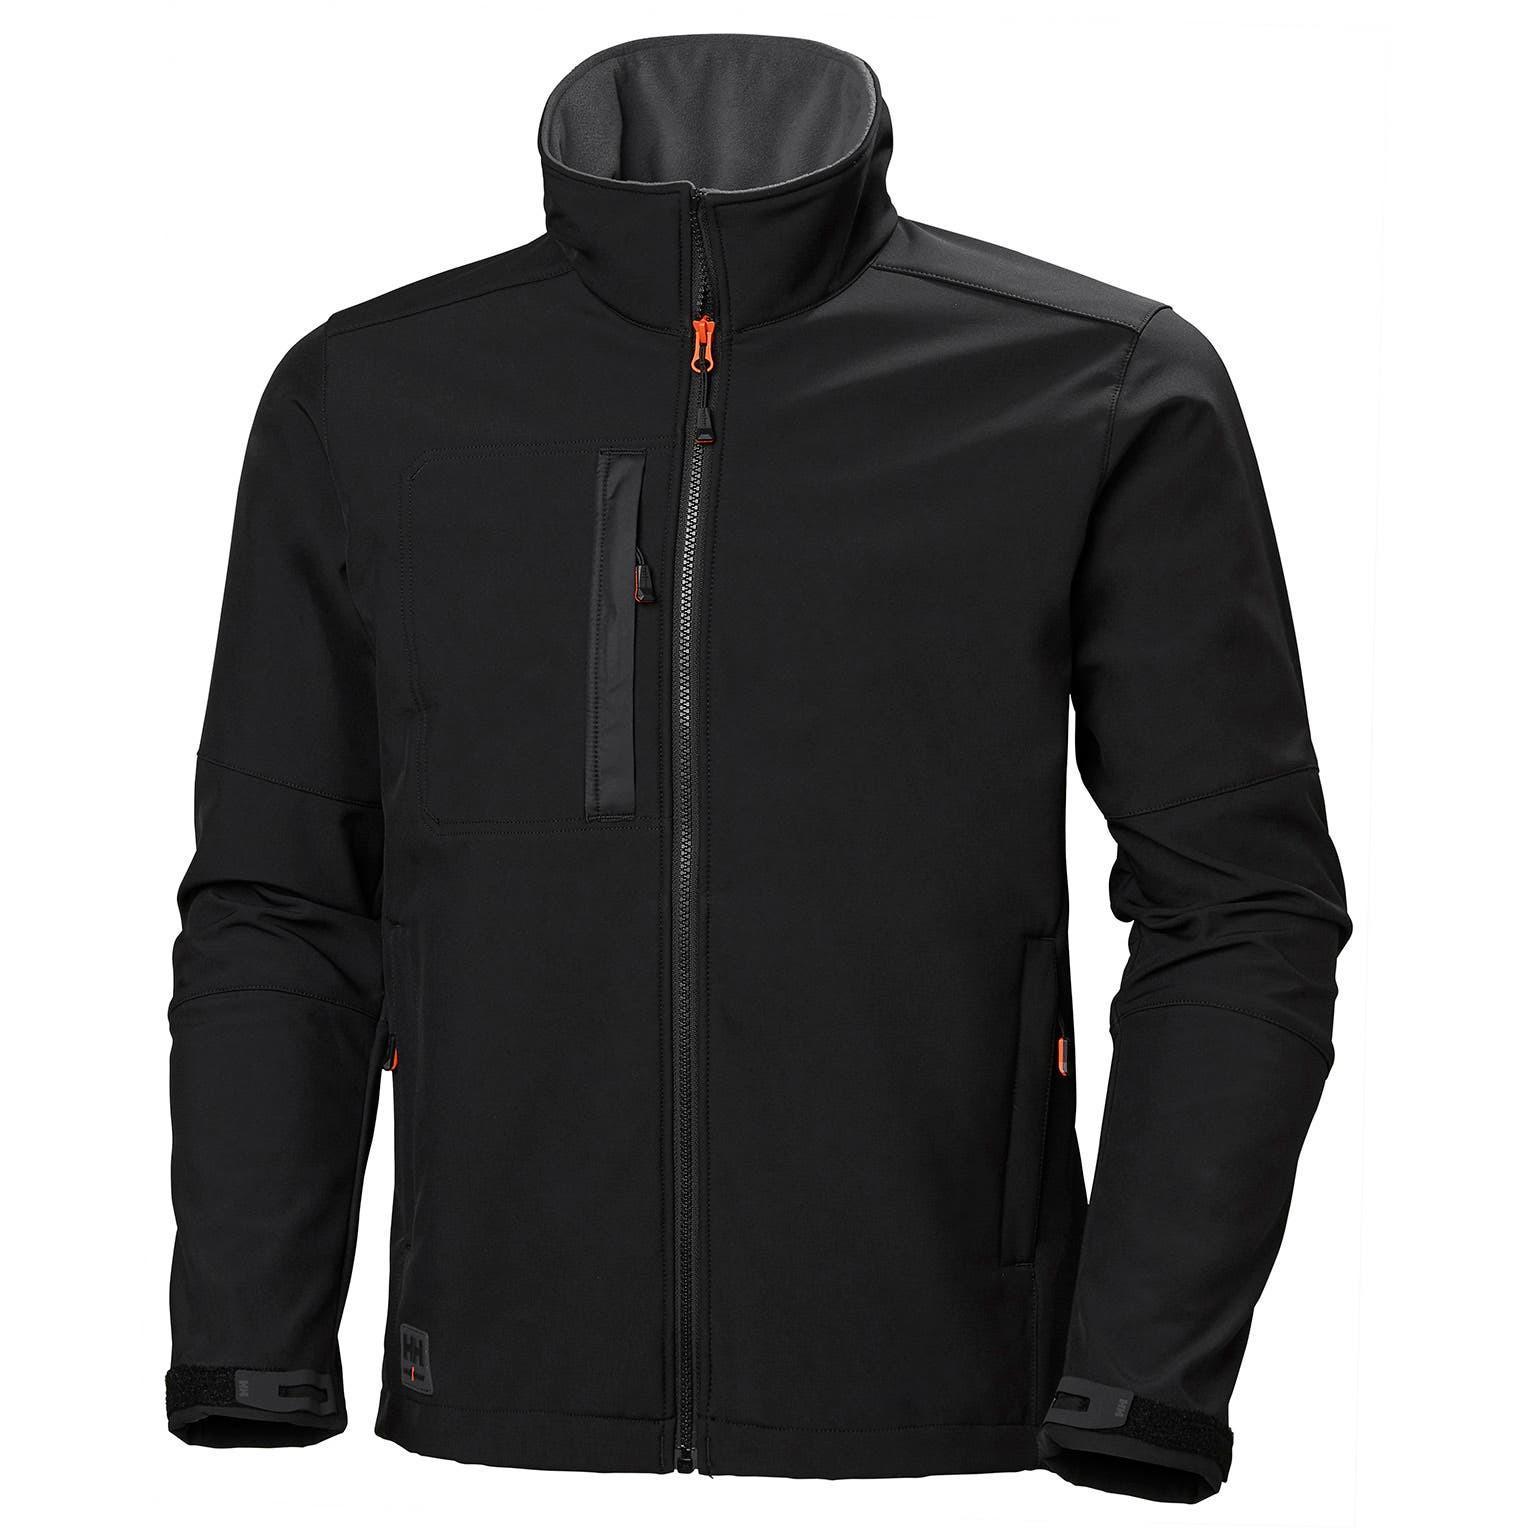 Куртка Helly Hansen Kensington Softshell Jacket - 74231 (Black; L)